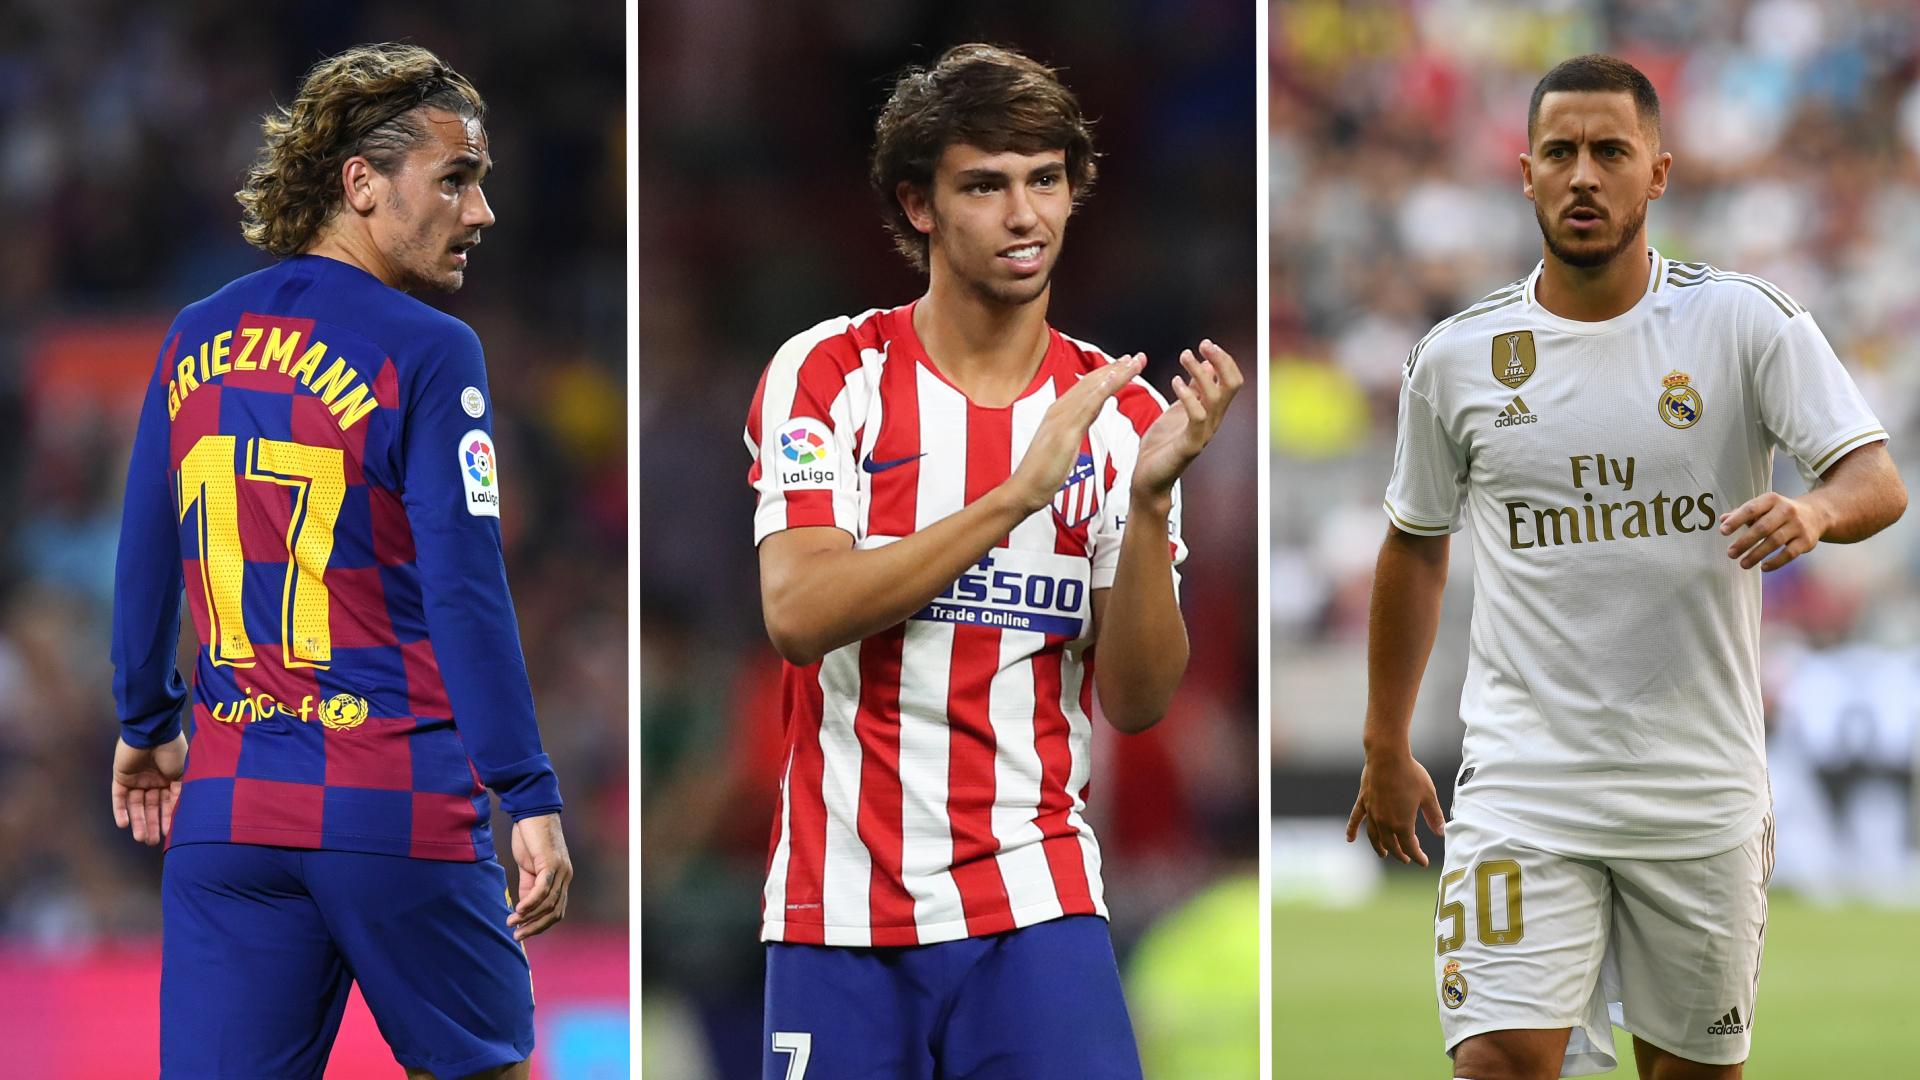 Mercato - Griezmann, Joao Felix, Hazard : les 20 plus gros transferts de Liga